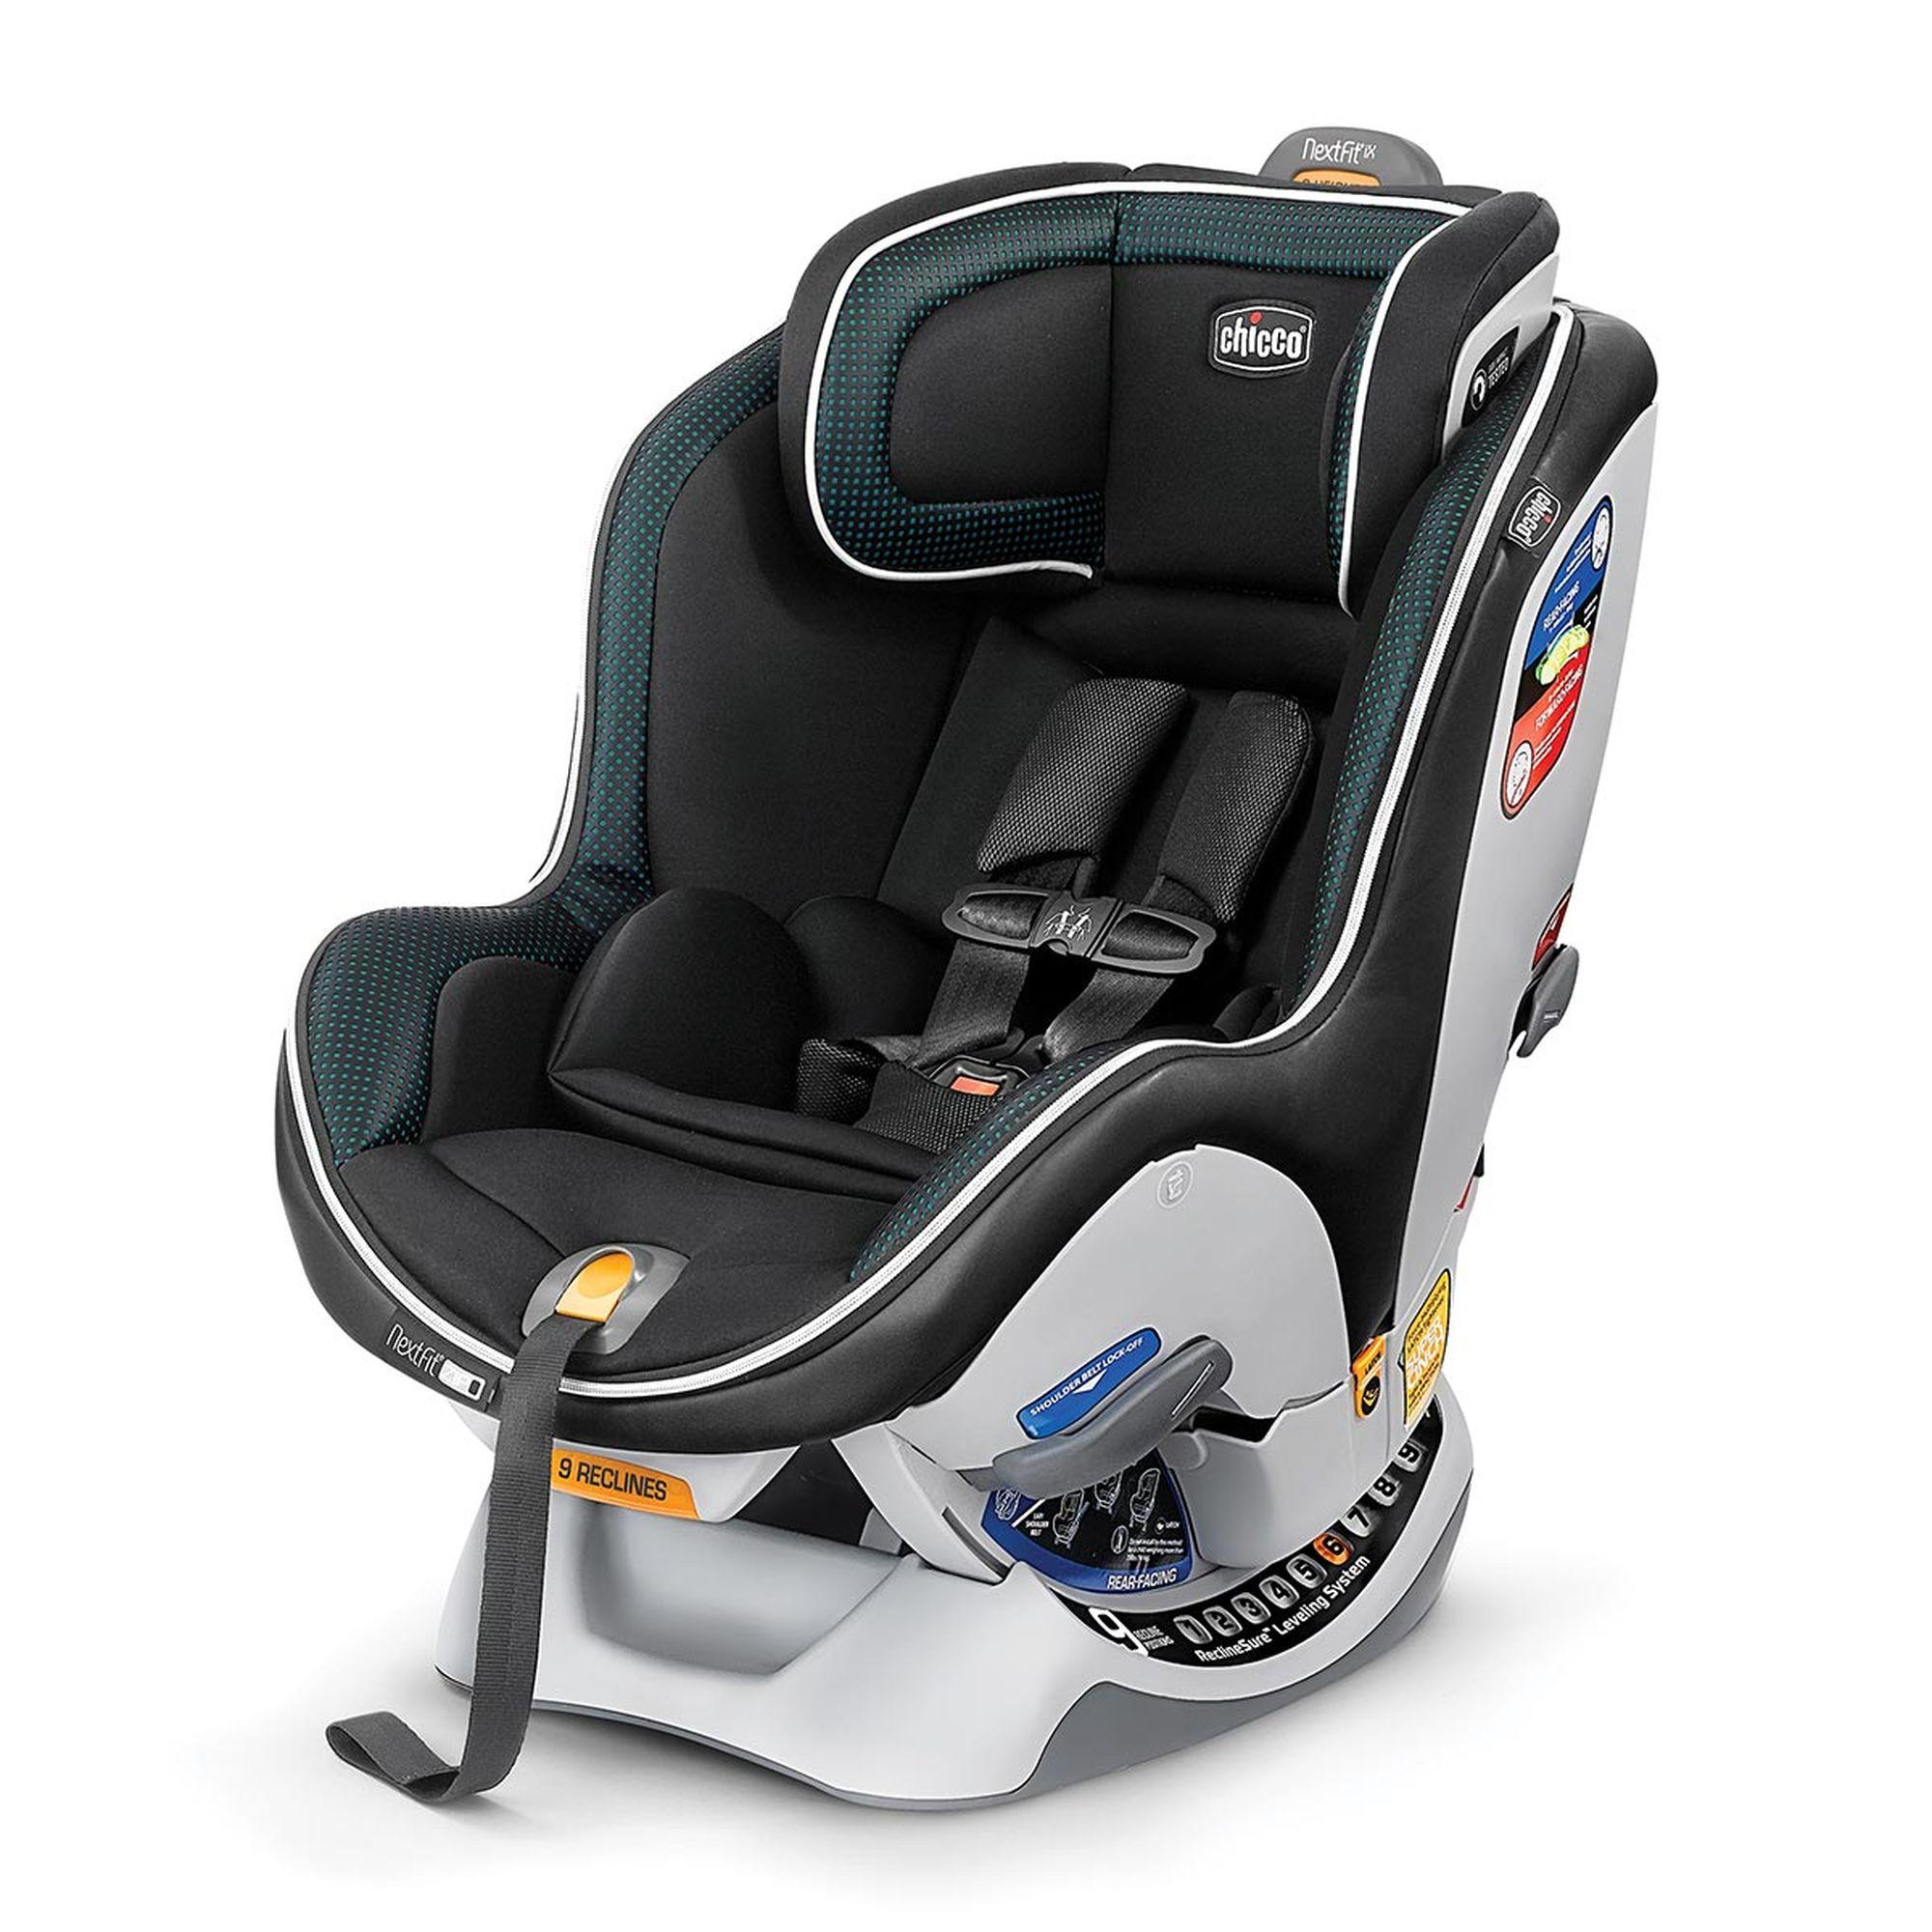 Chicco NextFit iX Zip LUXE Convertible Car Seat - Jade $249.99